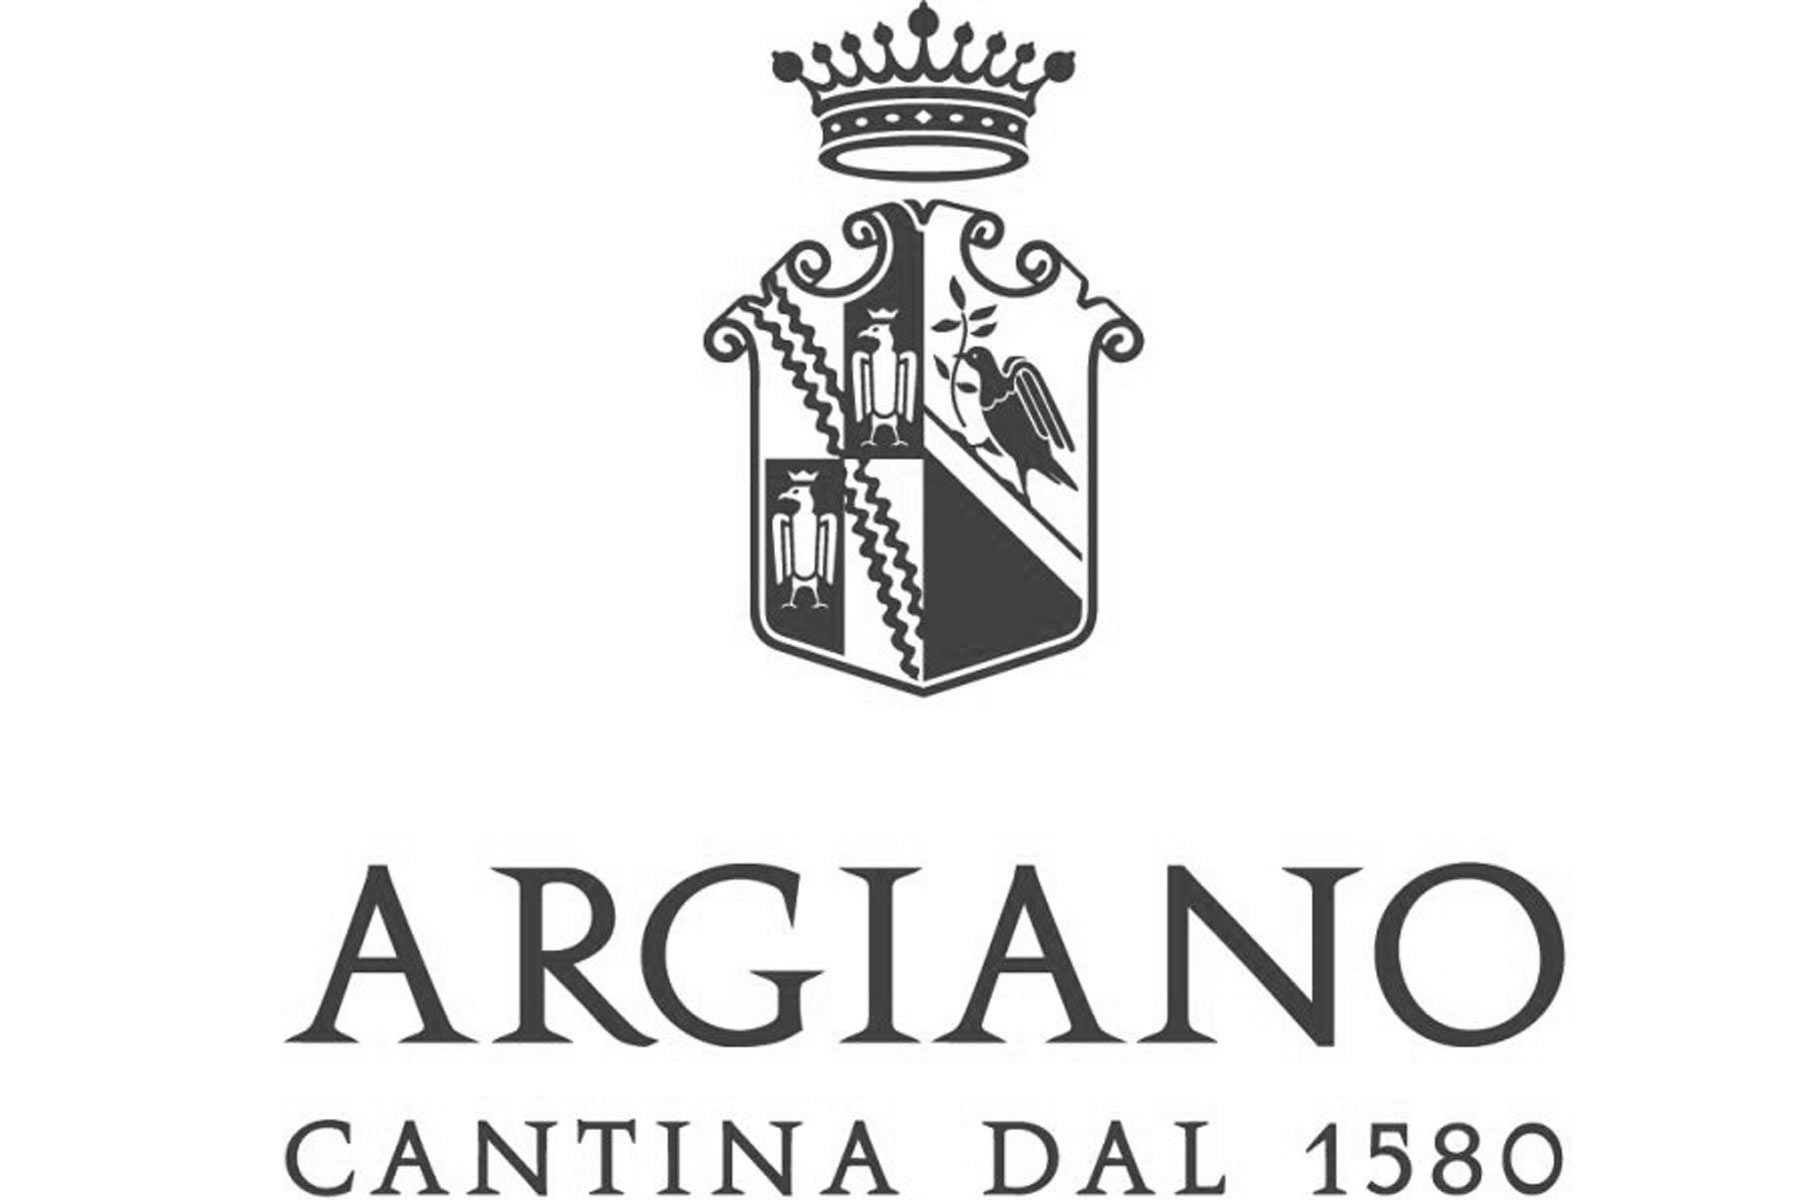 Argiano-4by6.jpg